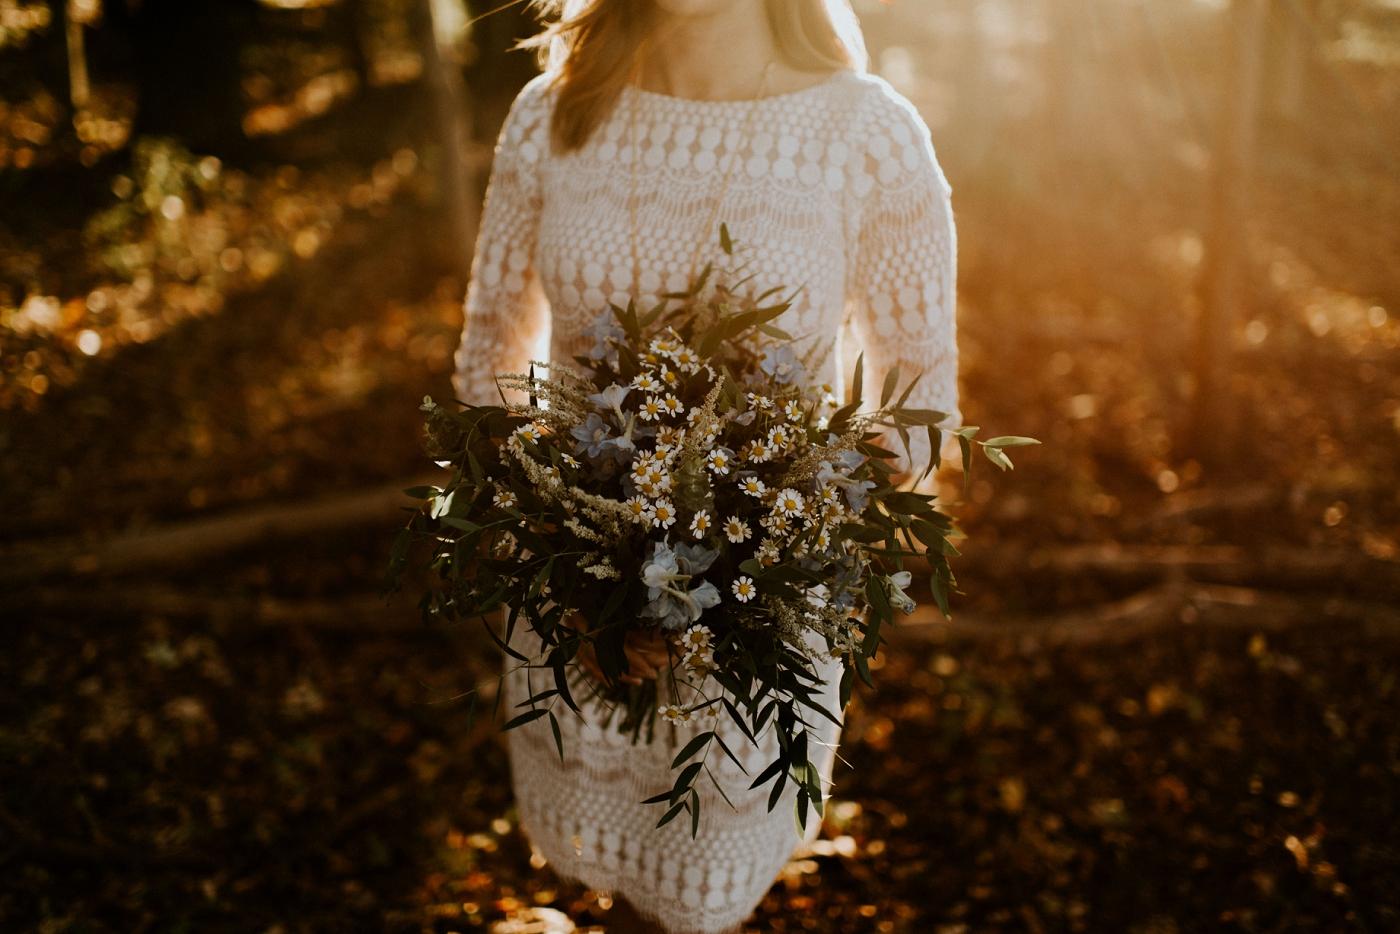 Wildflower-Field-Elopement-Vow-Renewal_Lisa+Chad_MJPHOTO-116.JPG